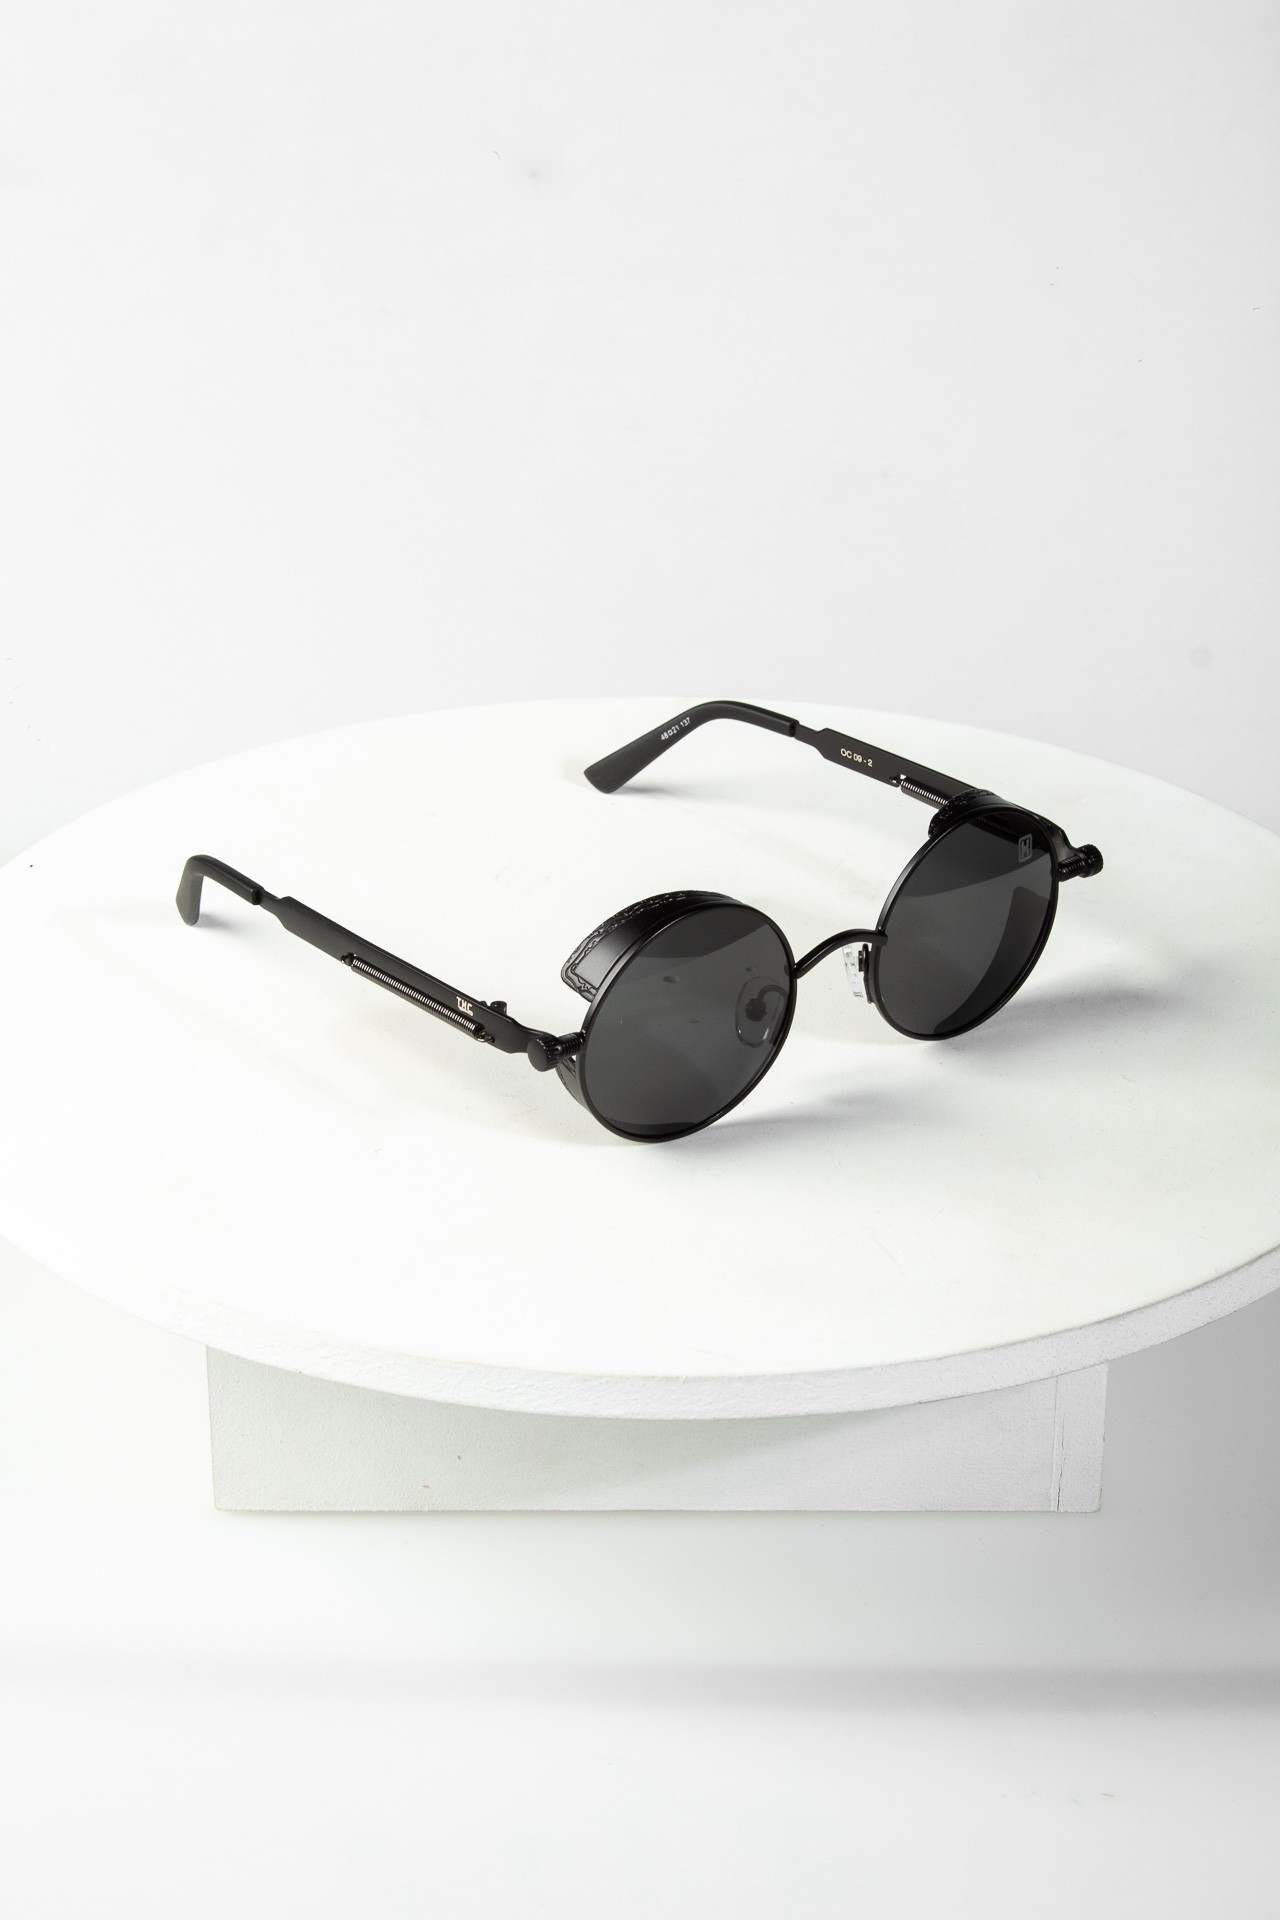 Óculos de Sol TXC 8051 OC 9.2 PRETO